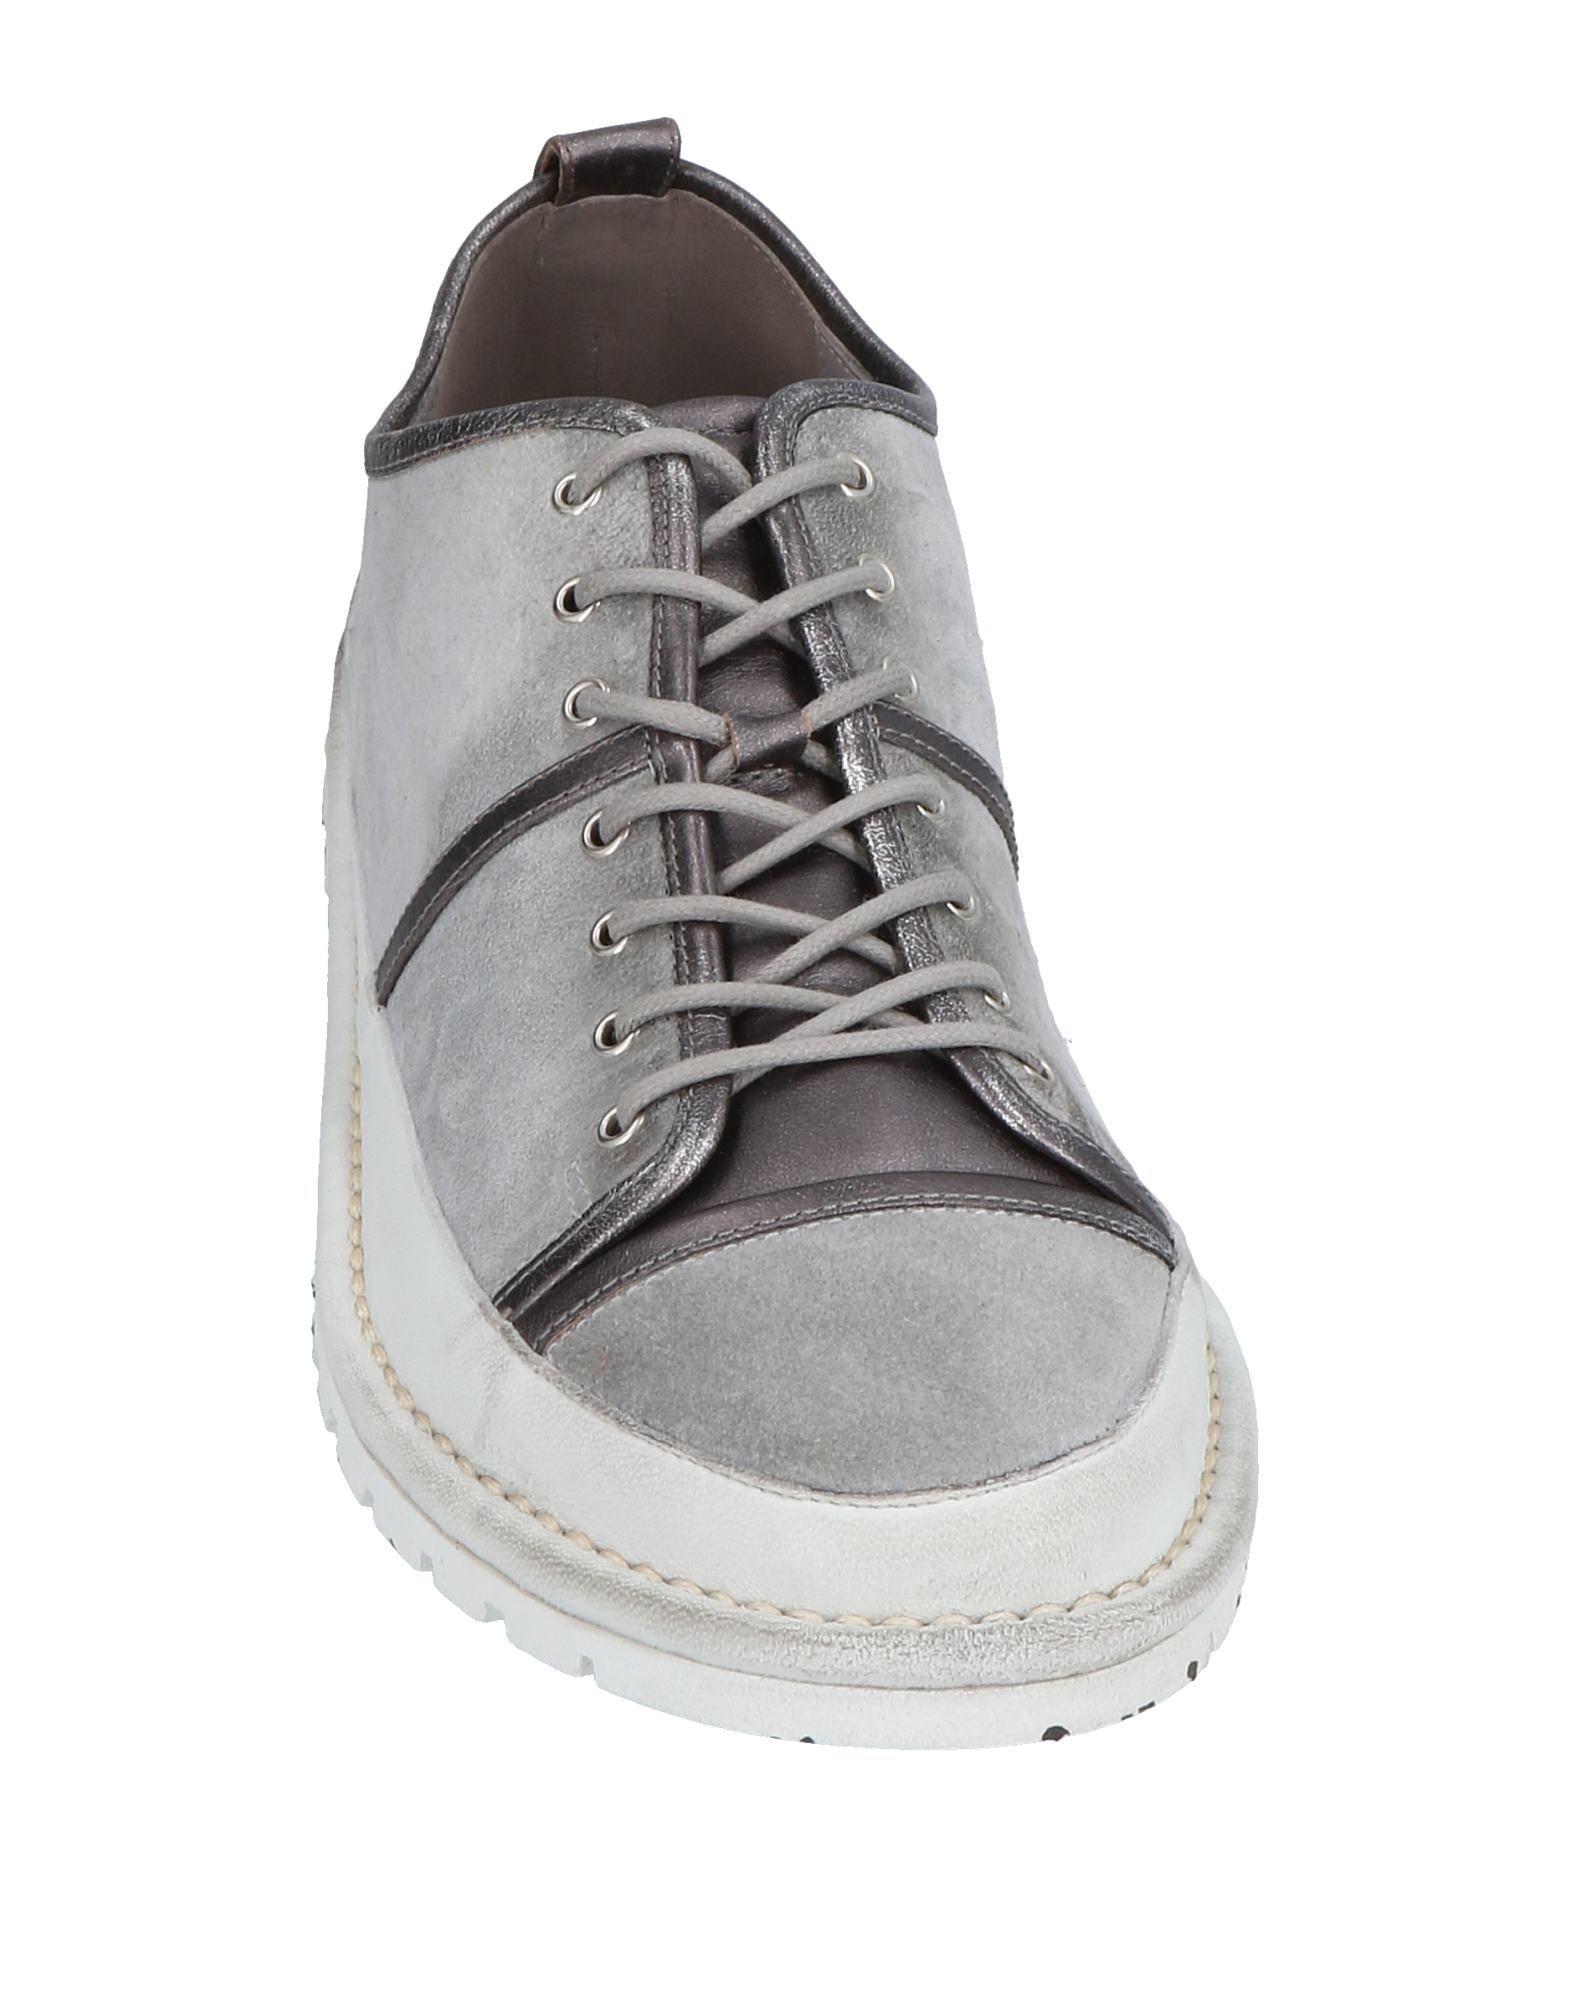 Marsèll Sneakers Herren Qualität  11479927PB Gute Qualität Herren beliebte Schuhe d151cd